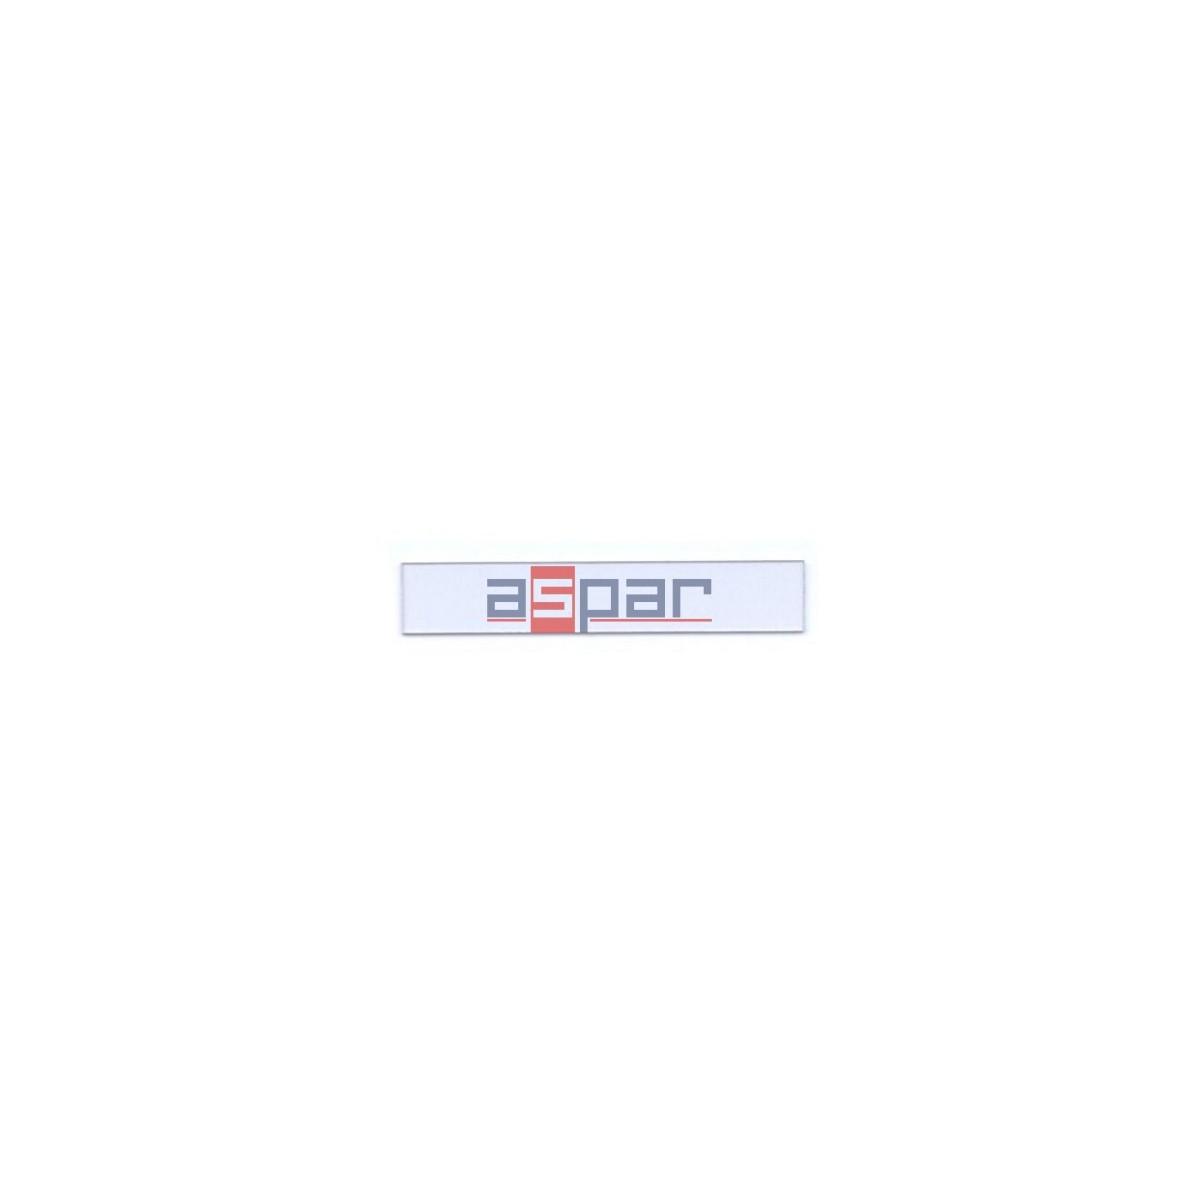 Pasek ochronny, STR 5 S F.SCHT 5 S, 1631940000